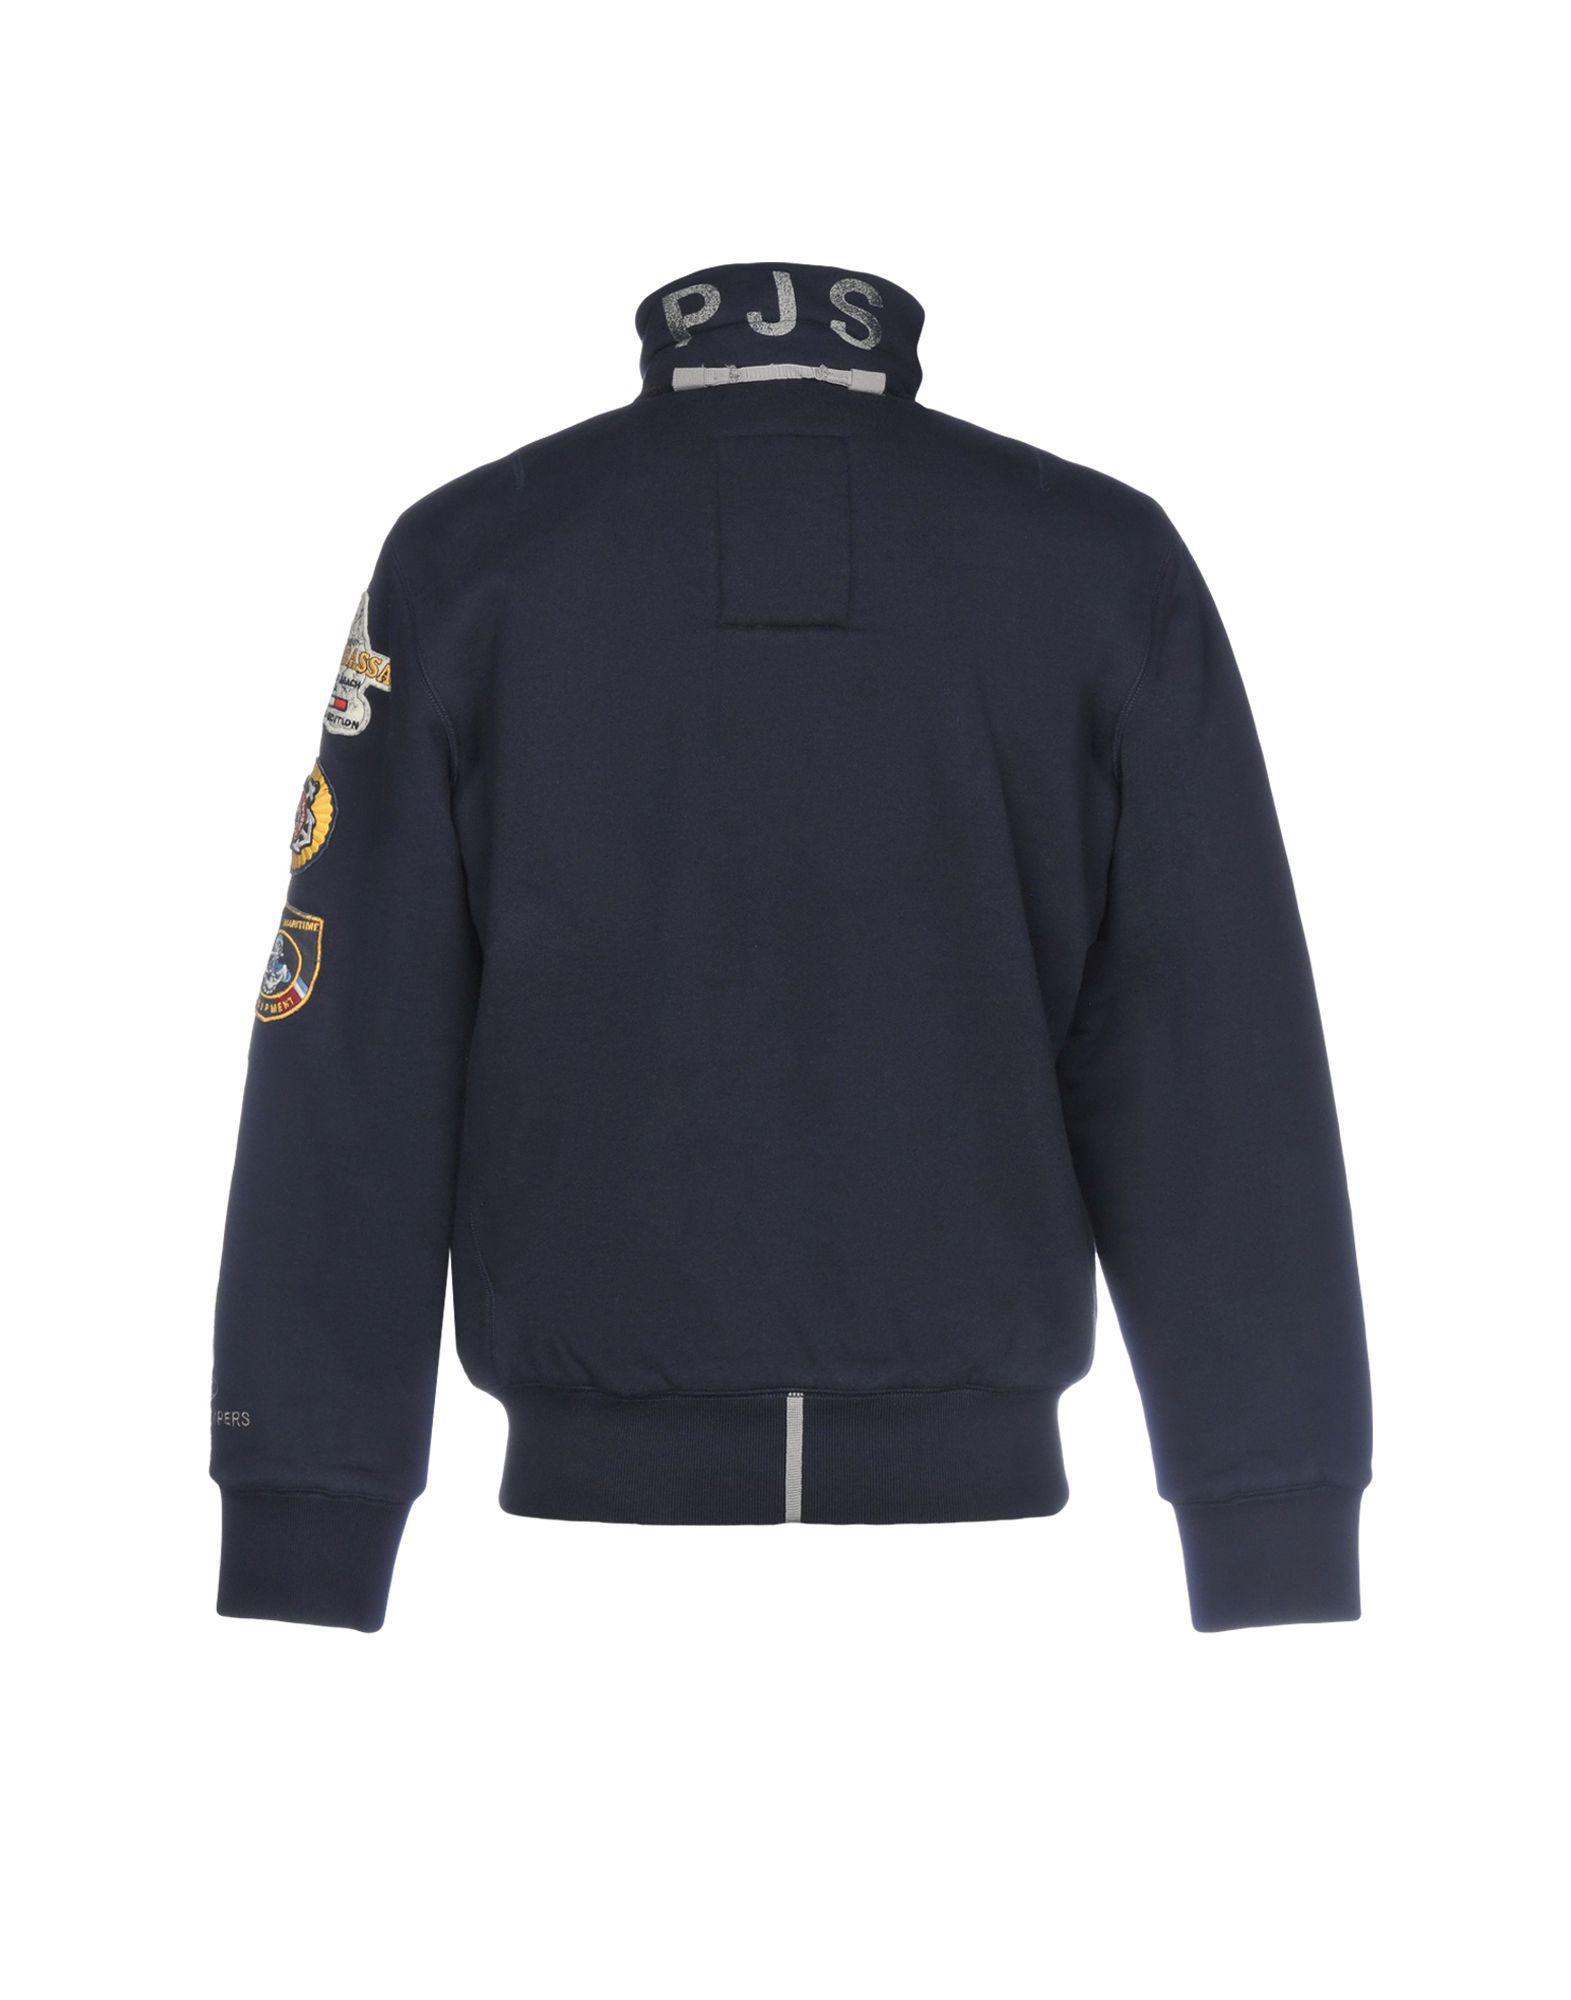 parajumper sweatshirt